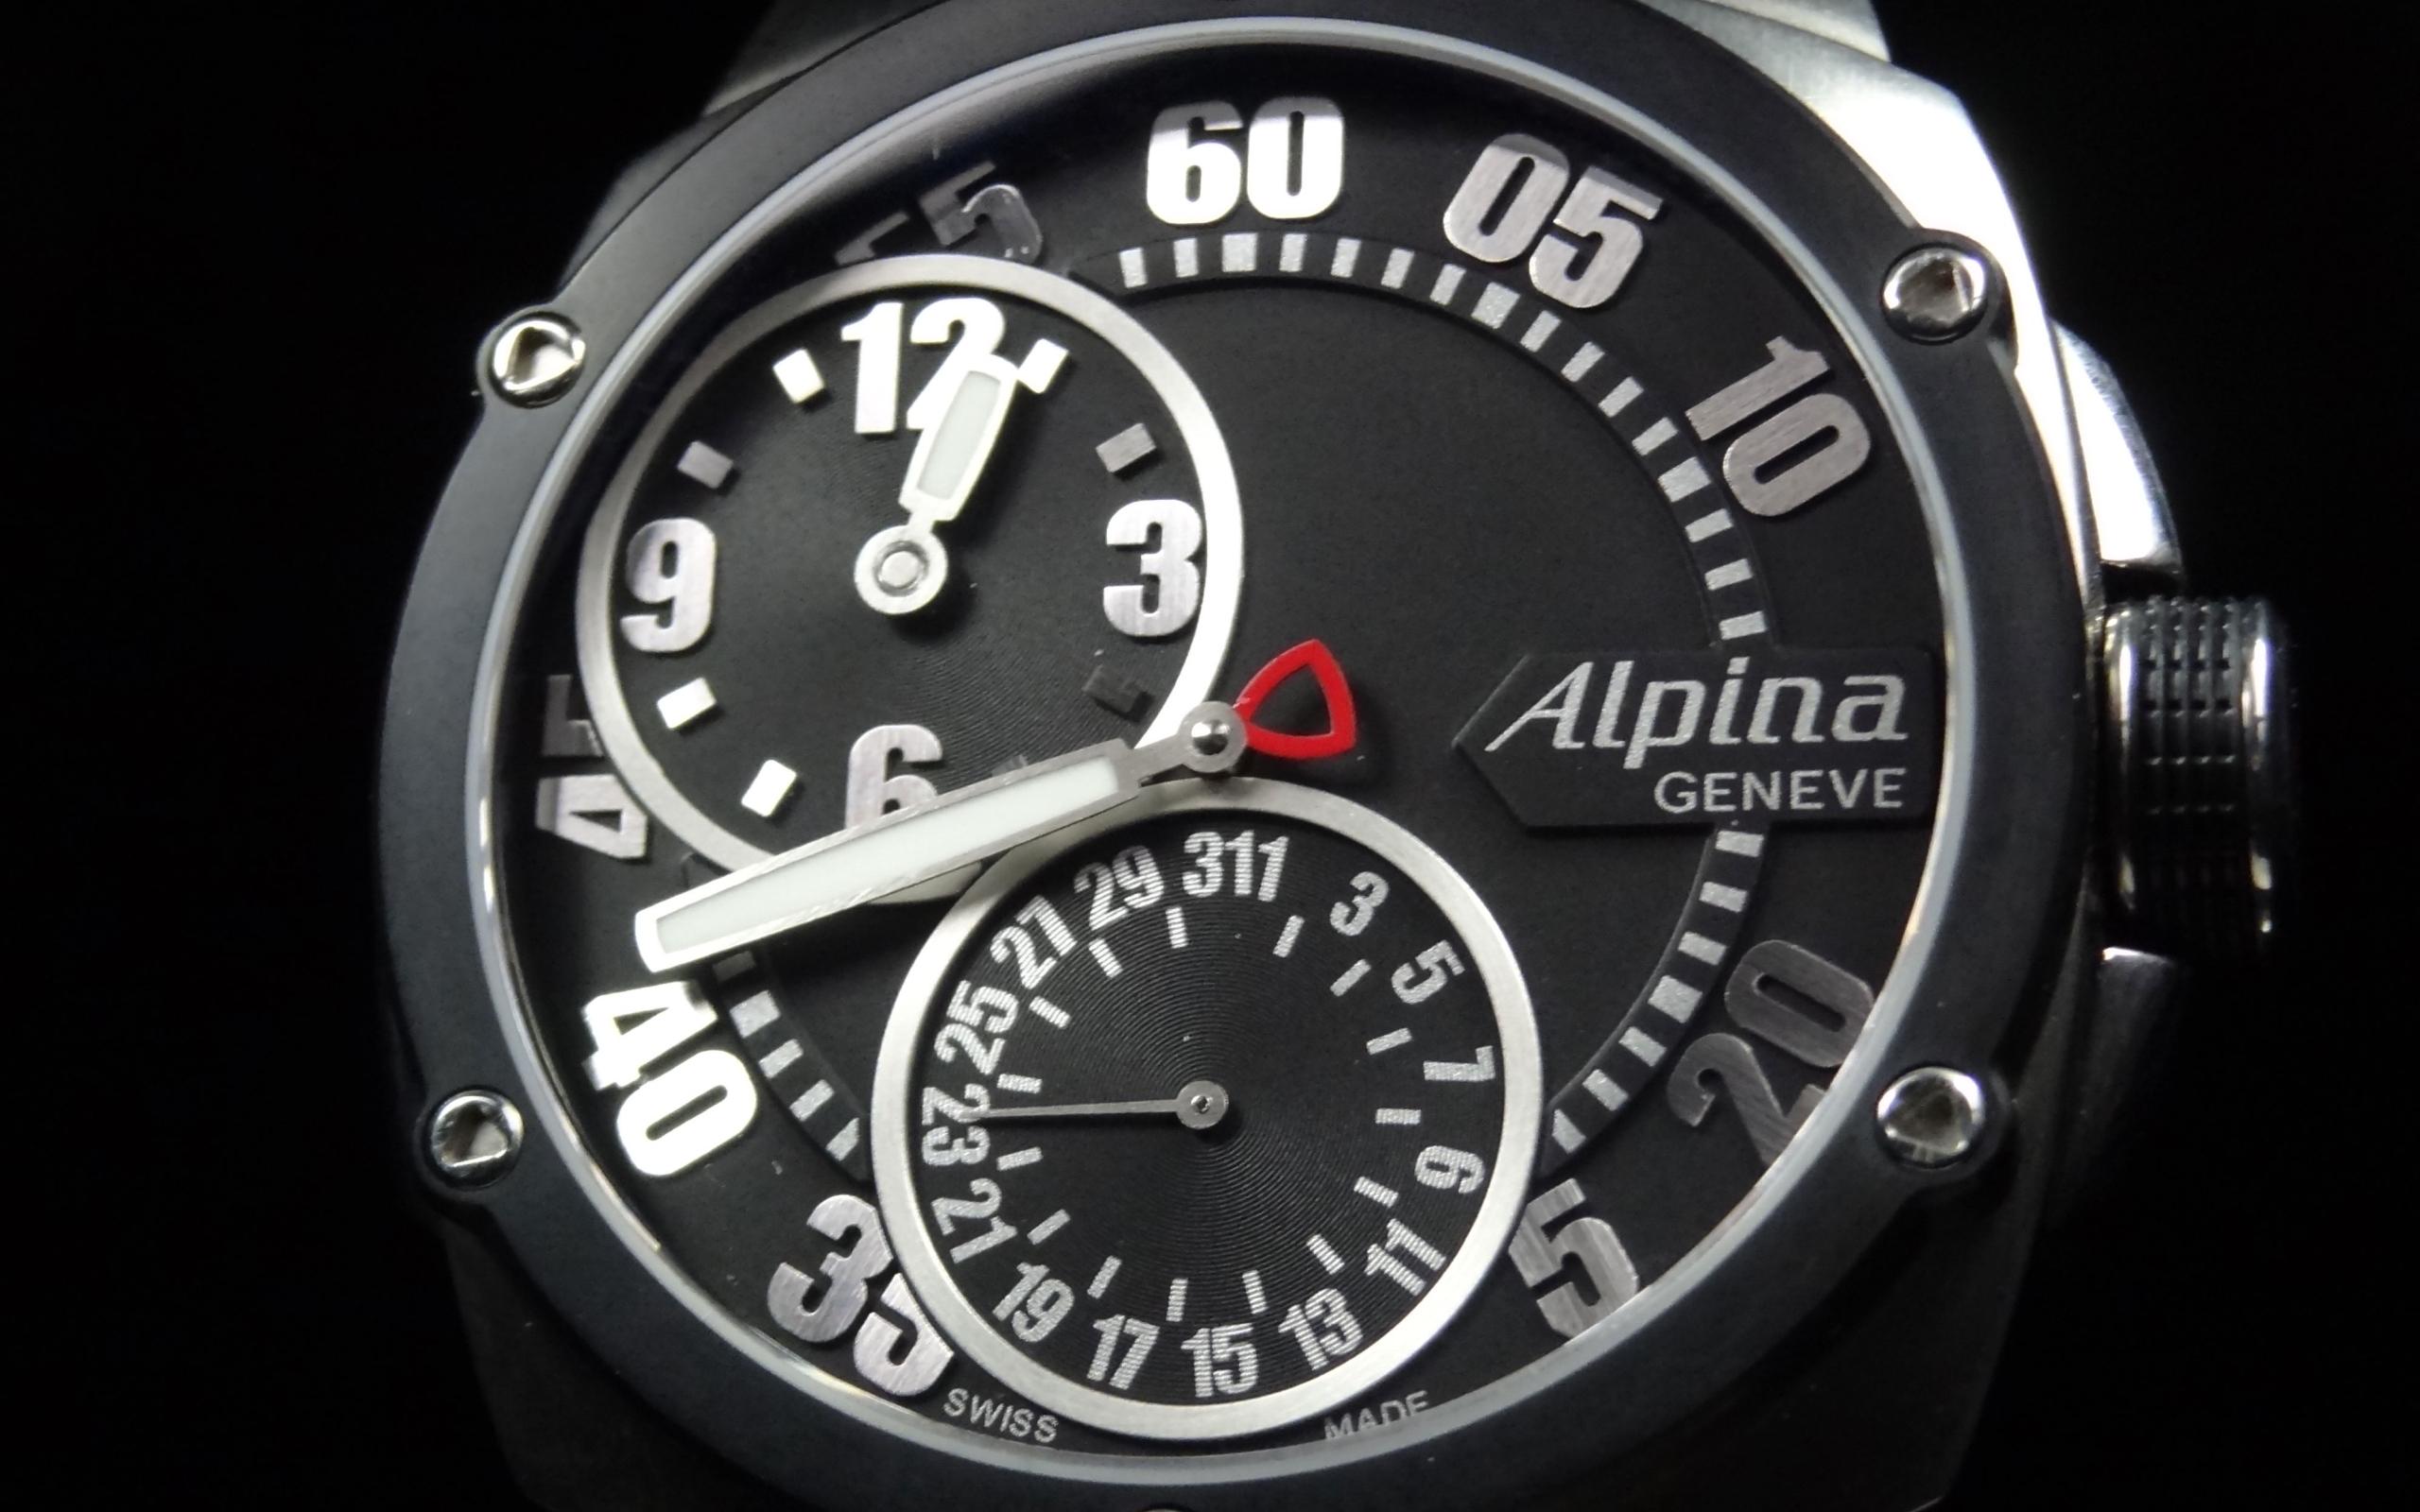 Watch: Watch, Alpina